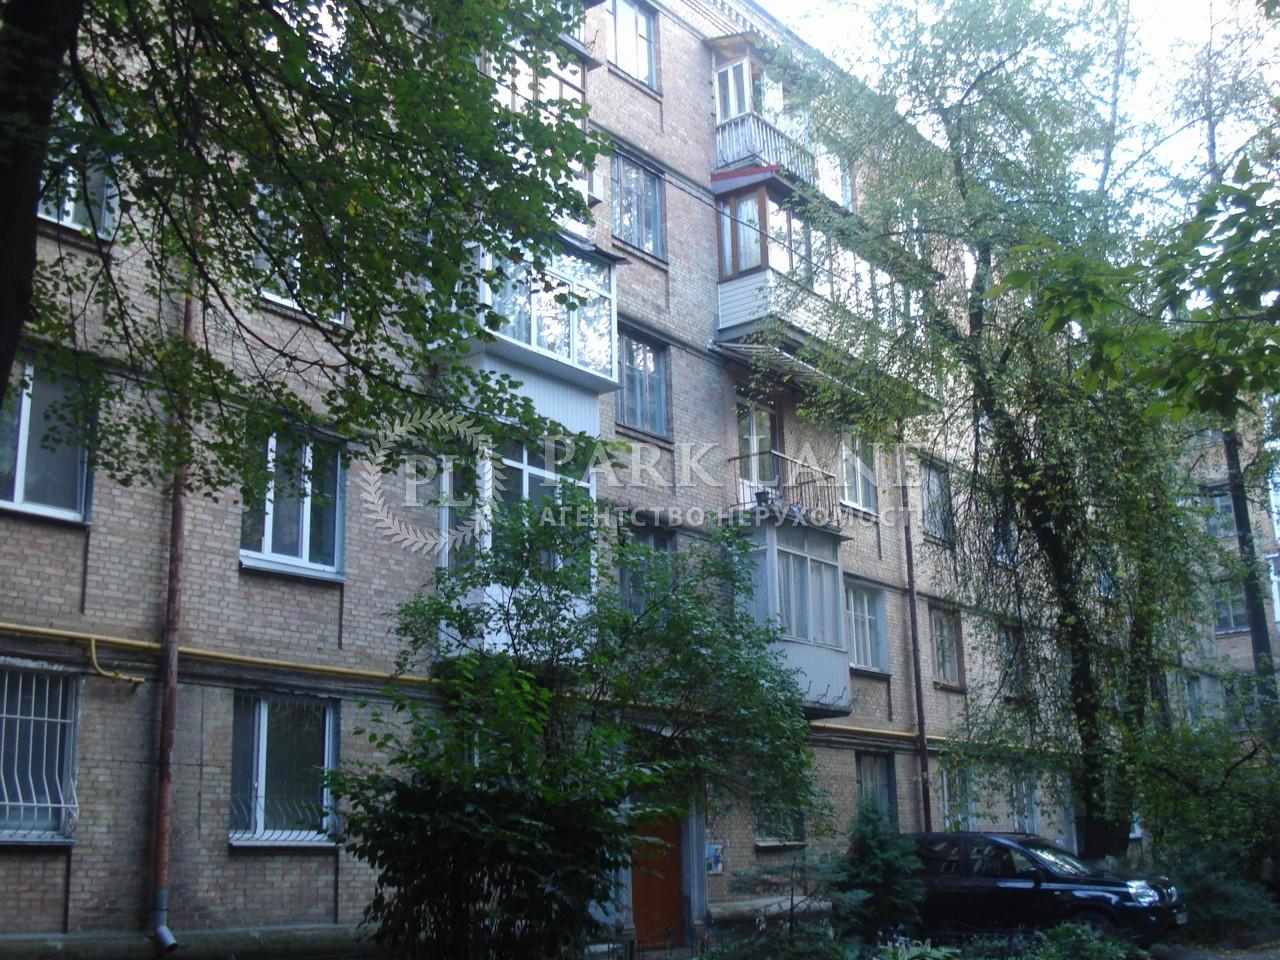 Квартира Гордиенко Костя пер. (Чекистов пер.), 10, Киев, J-4697 - Фото 4